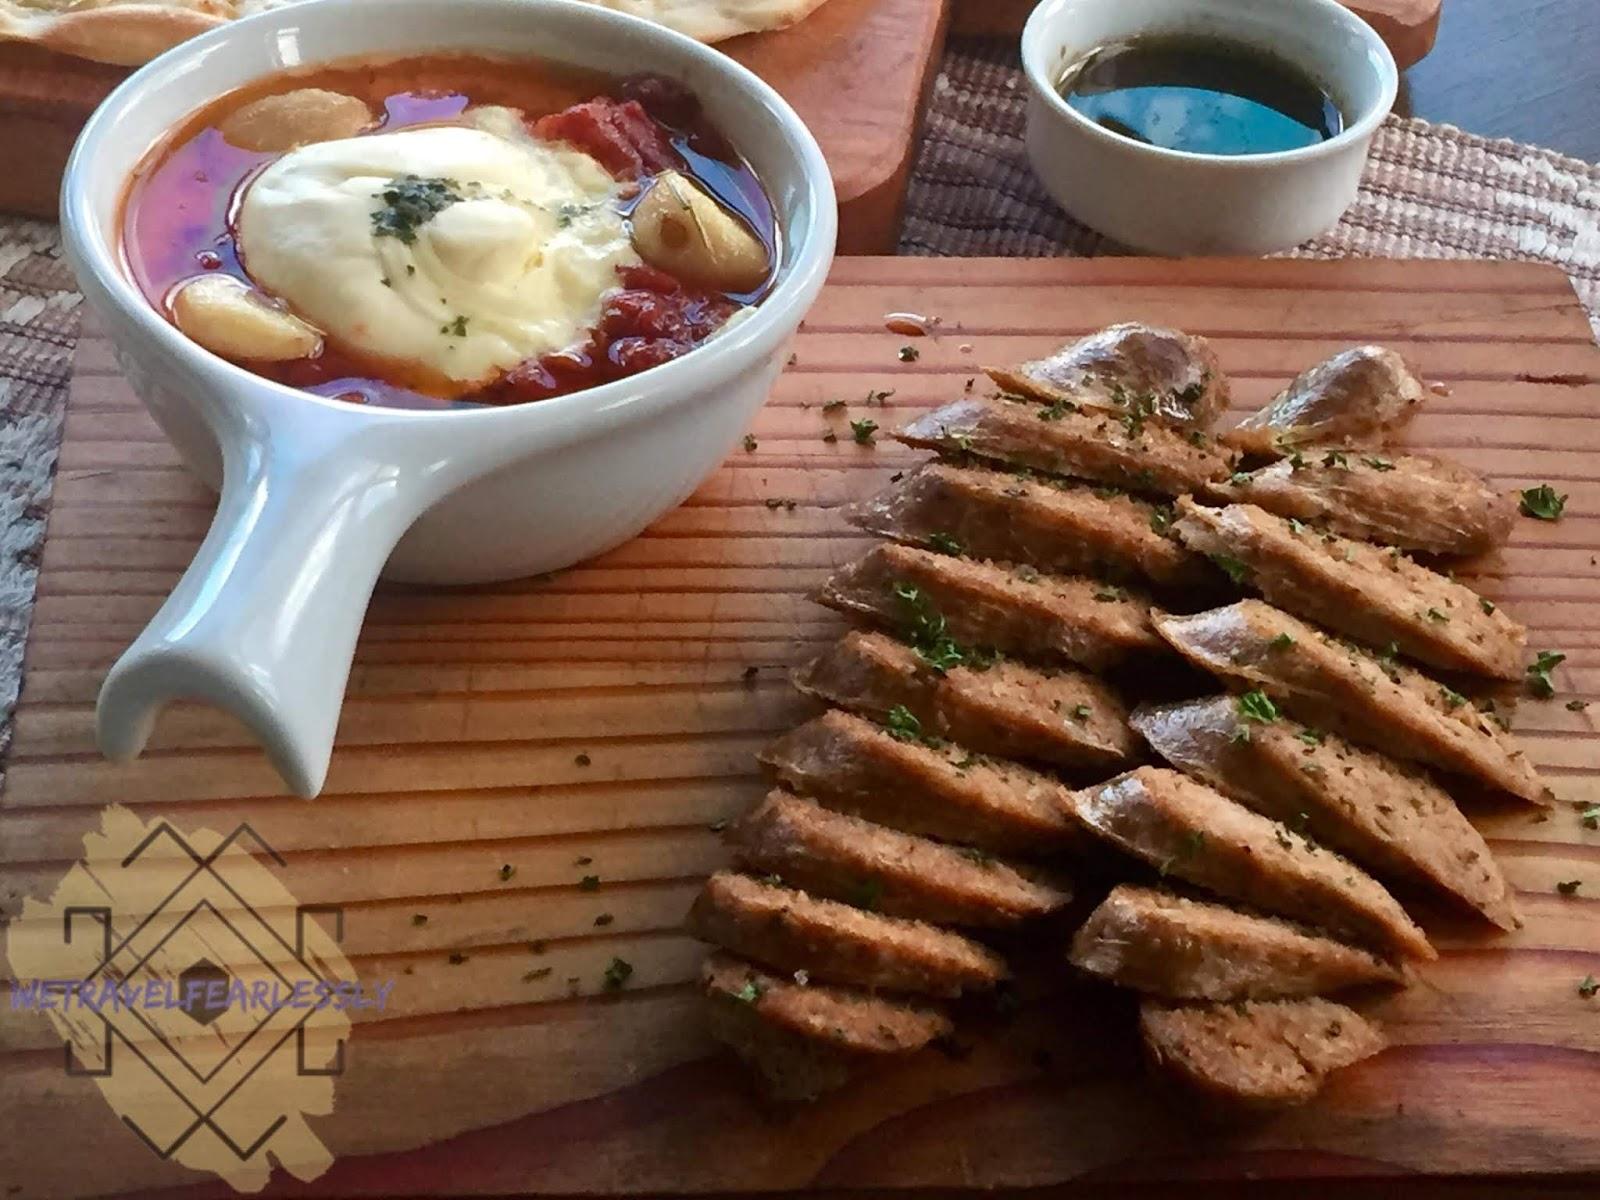 Burrata in Garlic Pomodoro and Italian Sausage in Cucina di Francesco in Libis, Quezon City